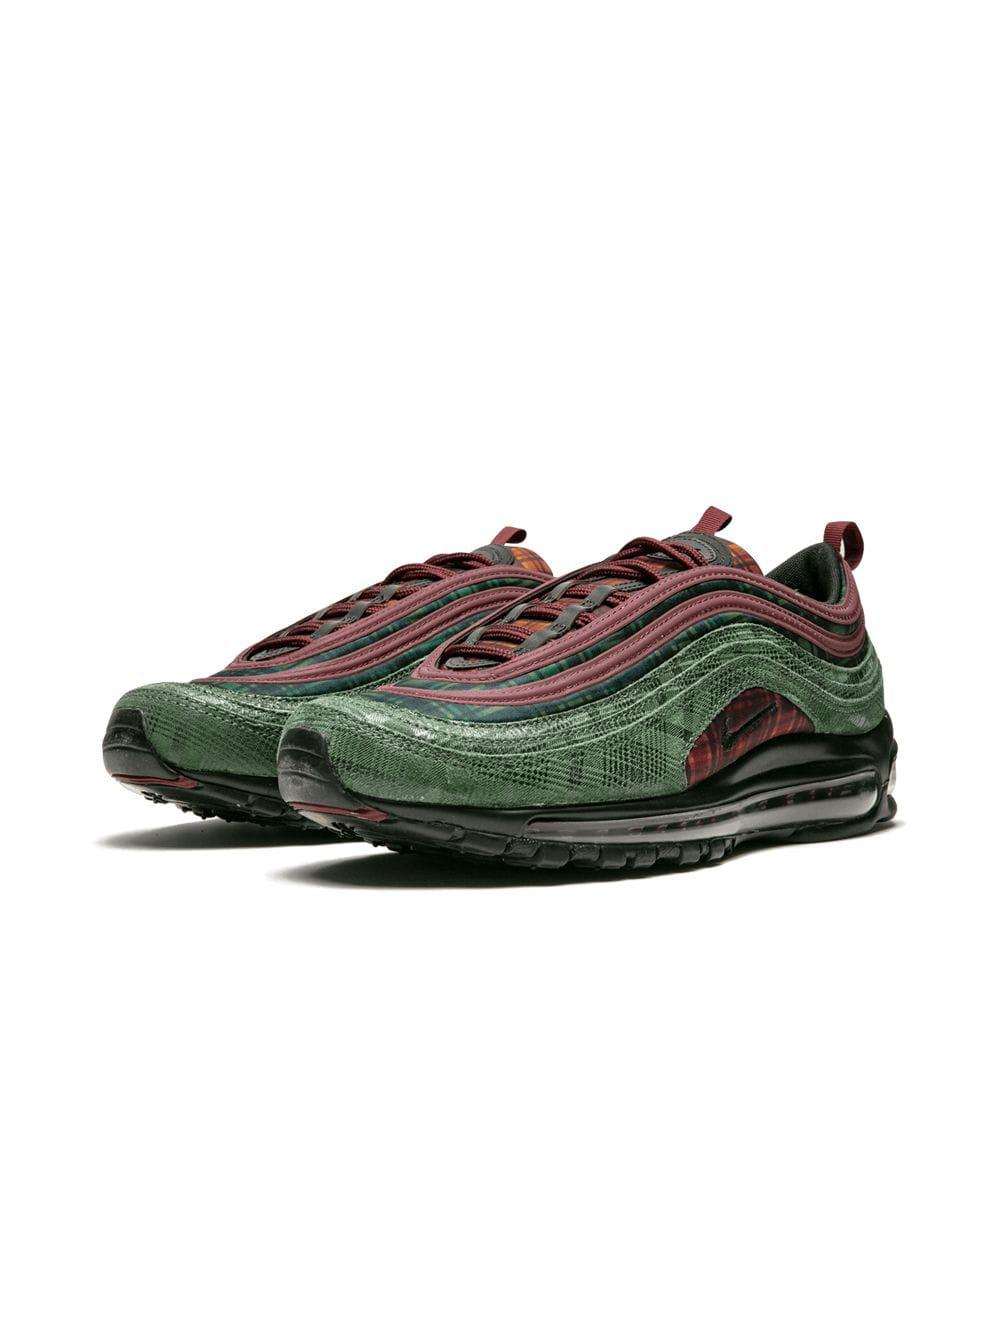 96766ab393ea0a Nike - Red Air Max 97 Nrg Sneakers for Men - Lyst. View fullscreen